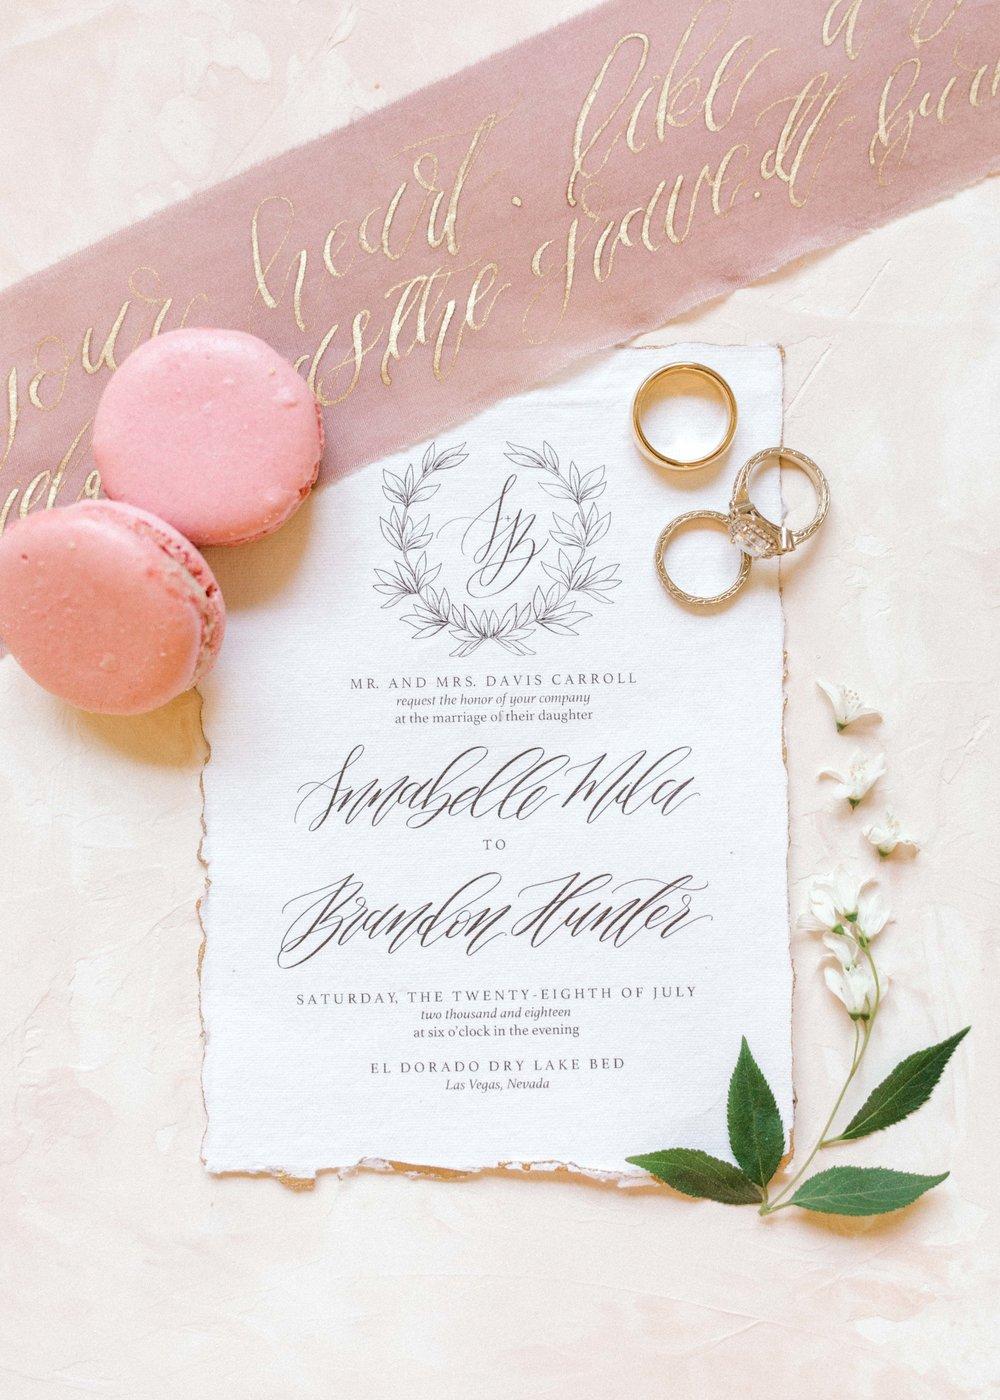 gracefullymade-wedding-invitation-wording-balletinspired.jpg